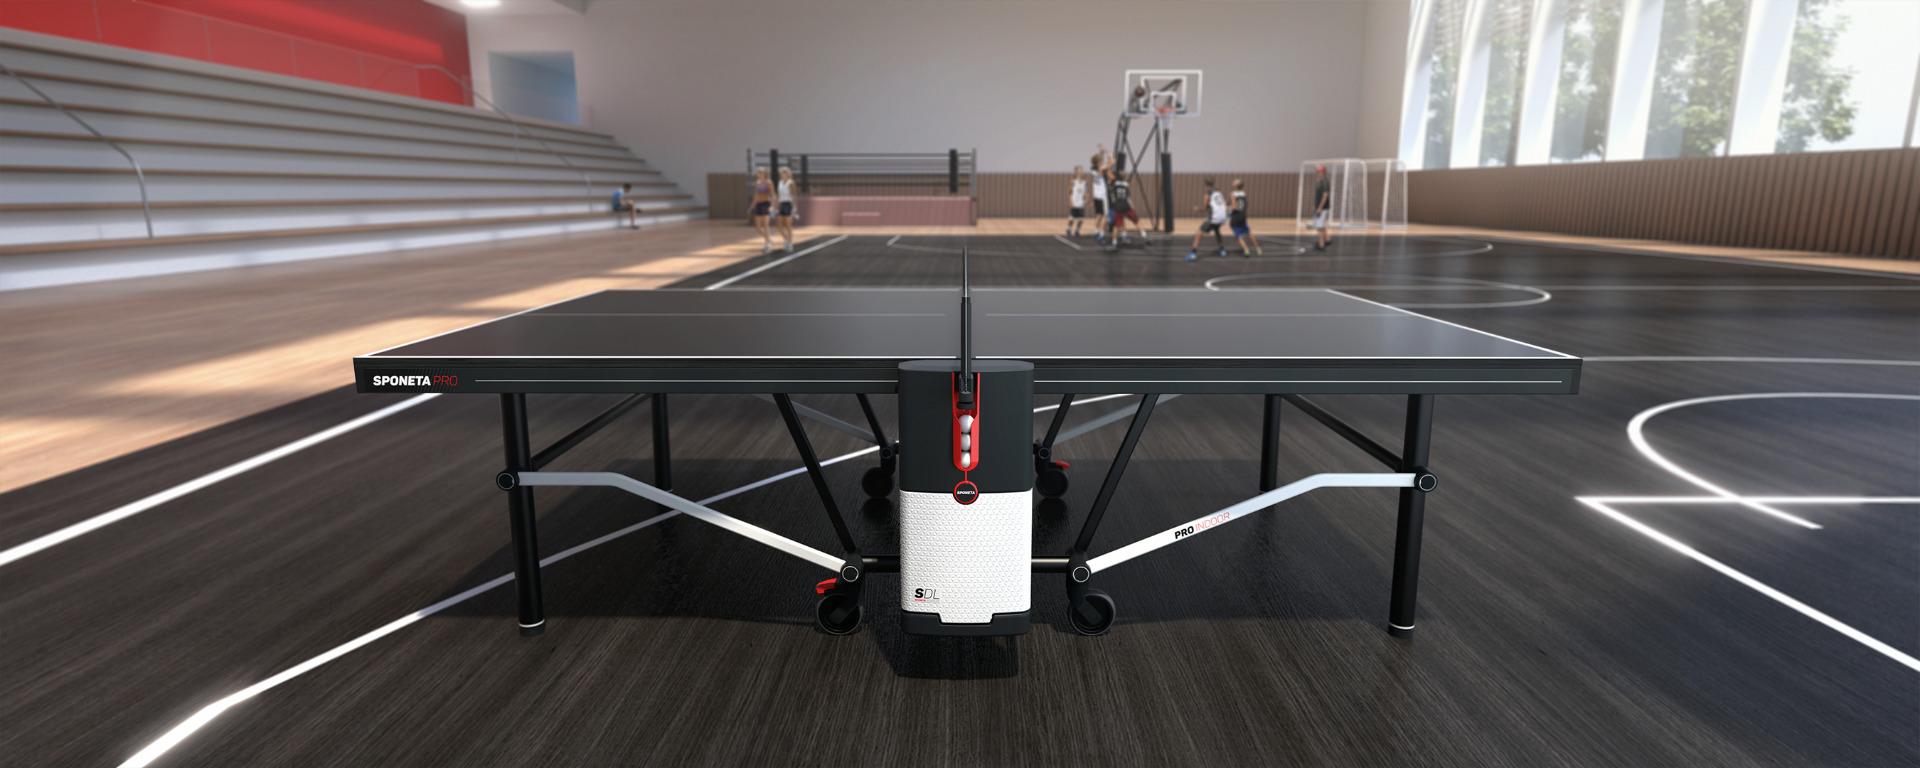 sponeta sdl tafeltennistafel indoor pro edition in gymzaal